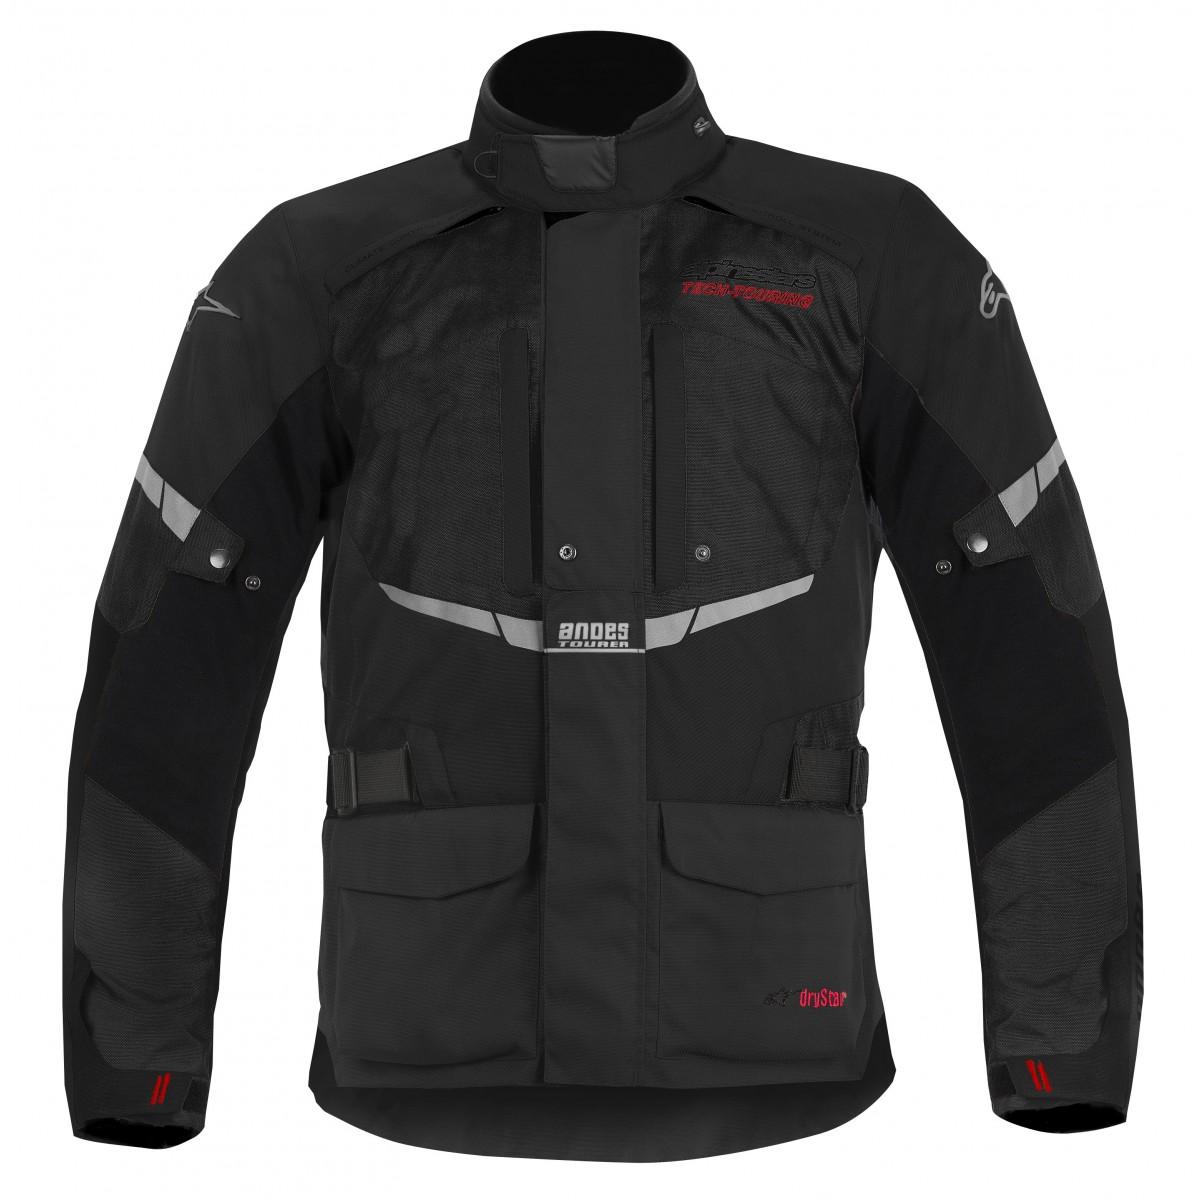 Jaqueta Alpinestars Andes Drystar® WP Preta (COMPRE JUNTO!) para Big Trail  - Super Bike - Loja Oficial Alpinestars